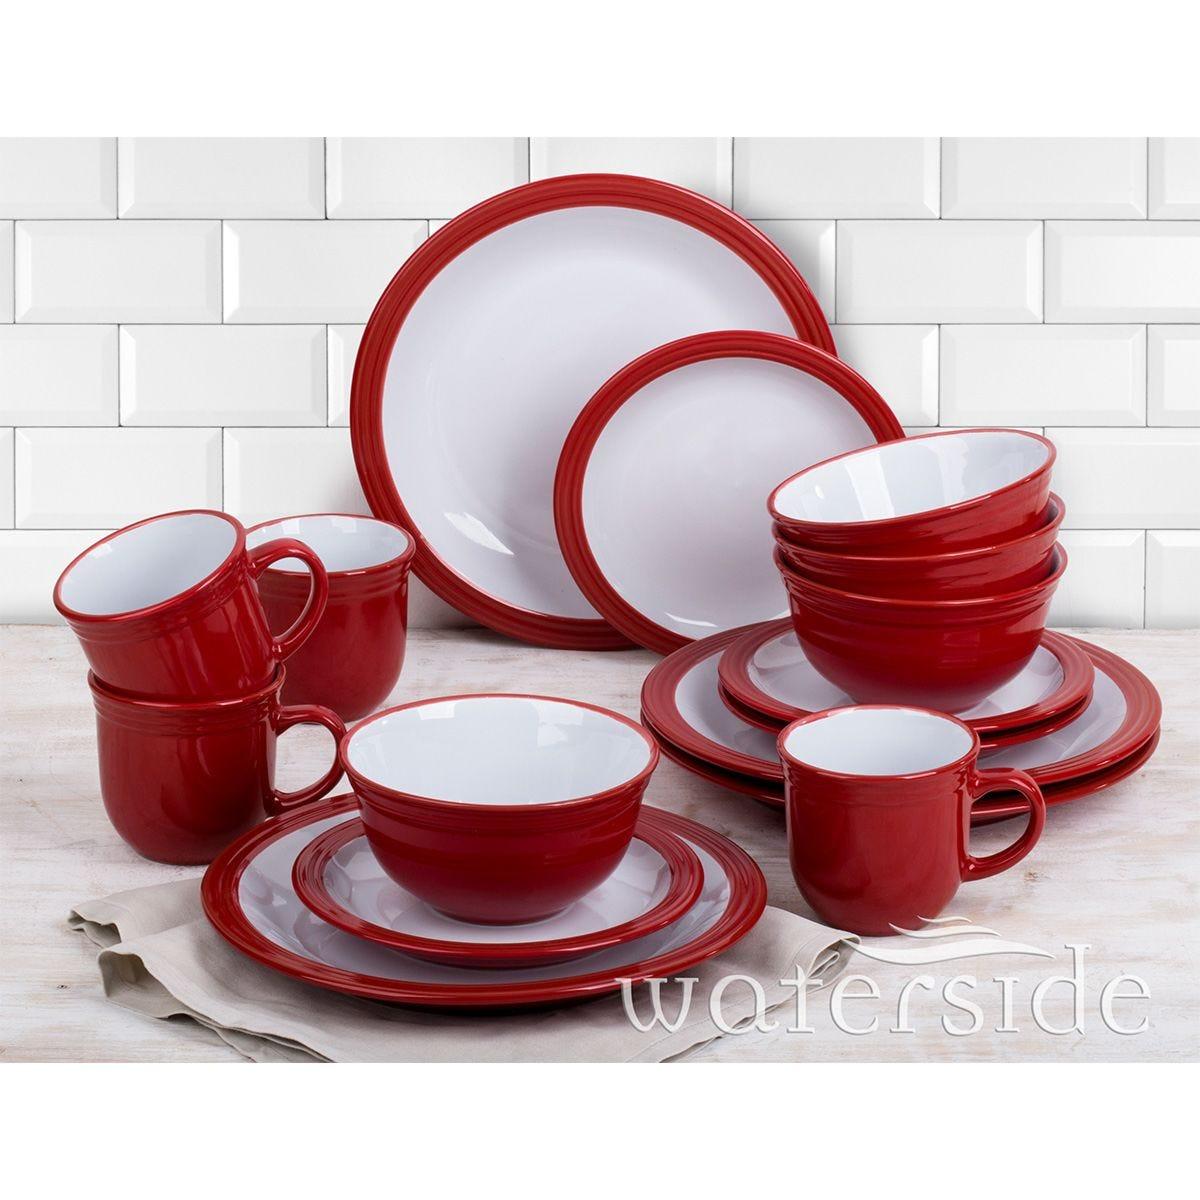 The Waterside 16pc Camden Dinner Set - Red